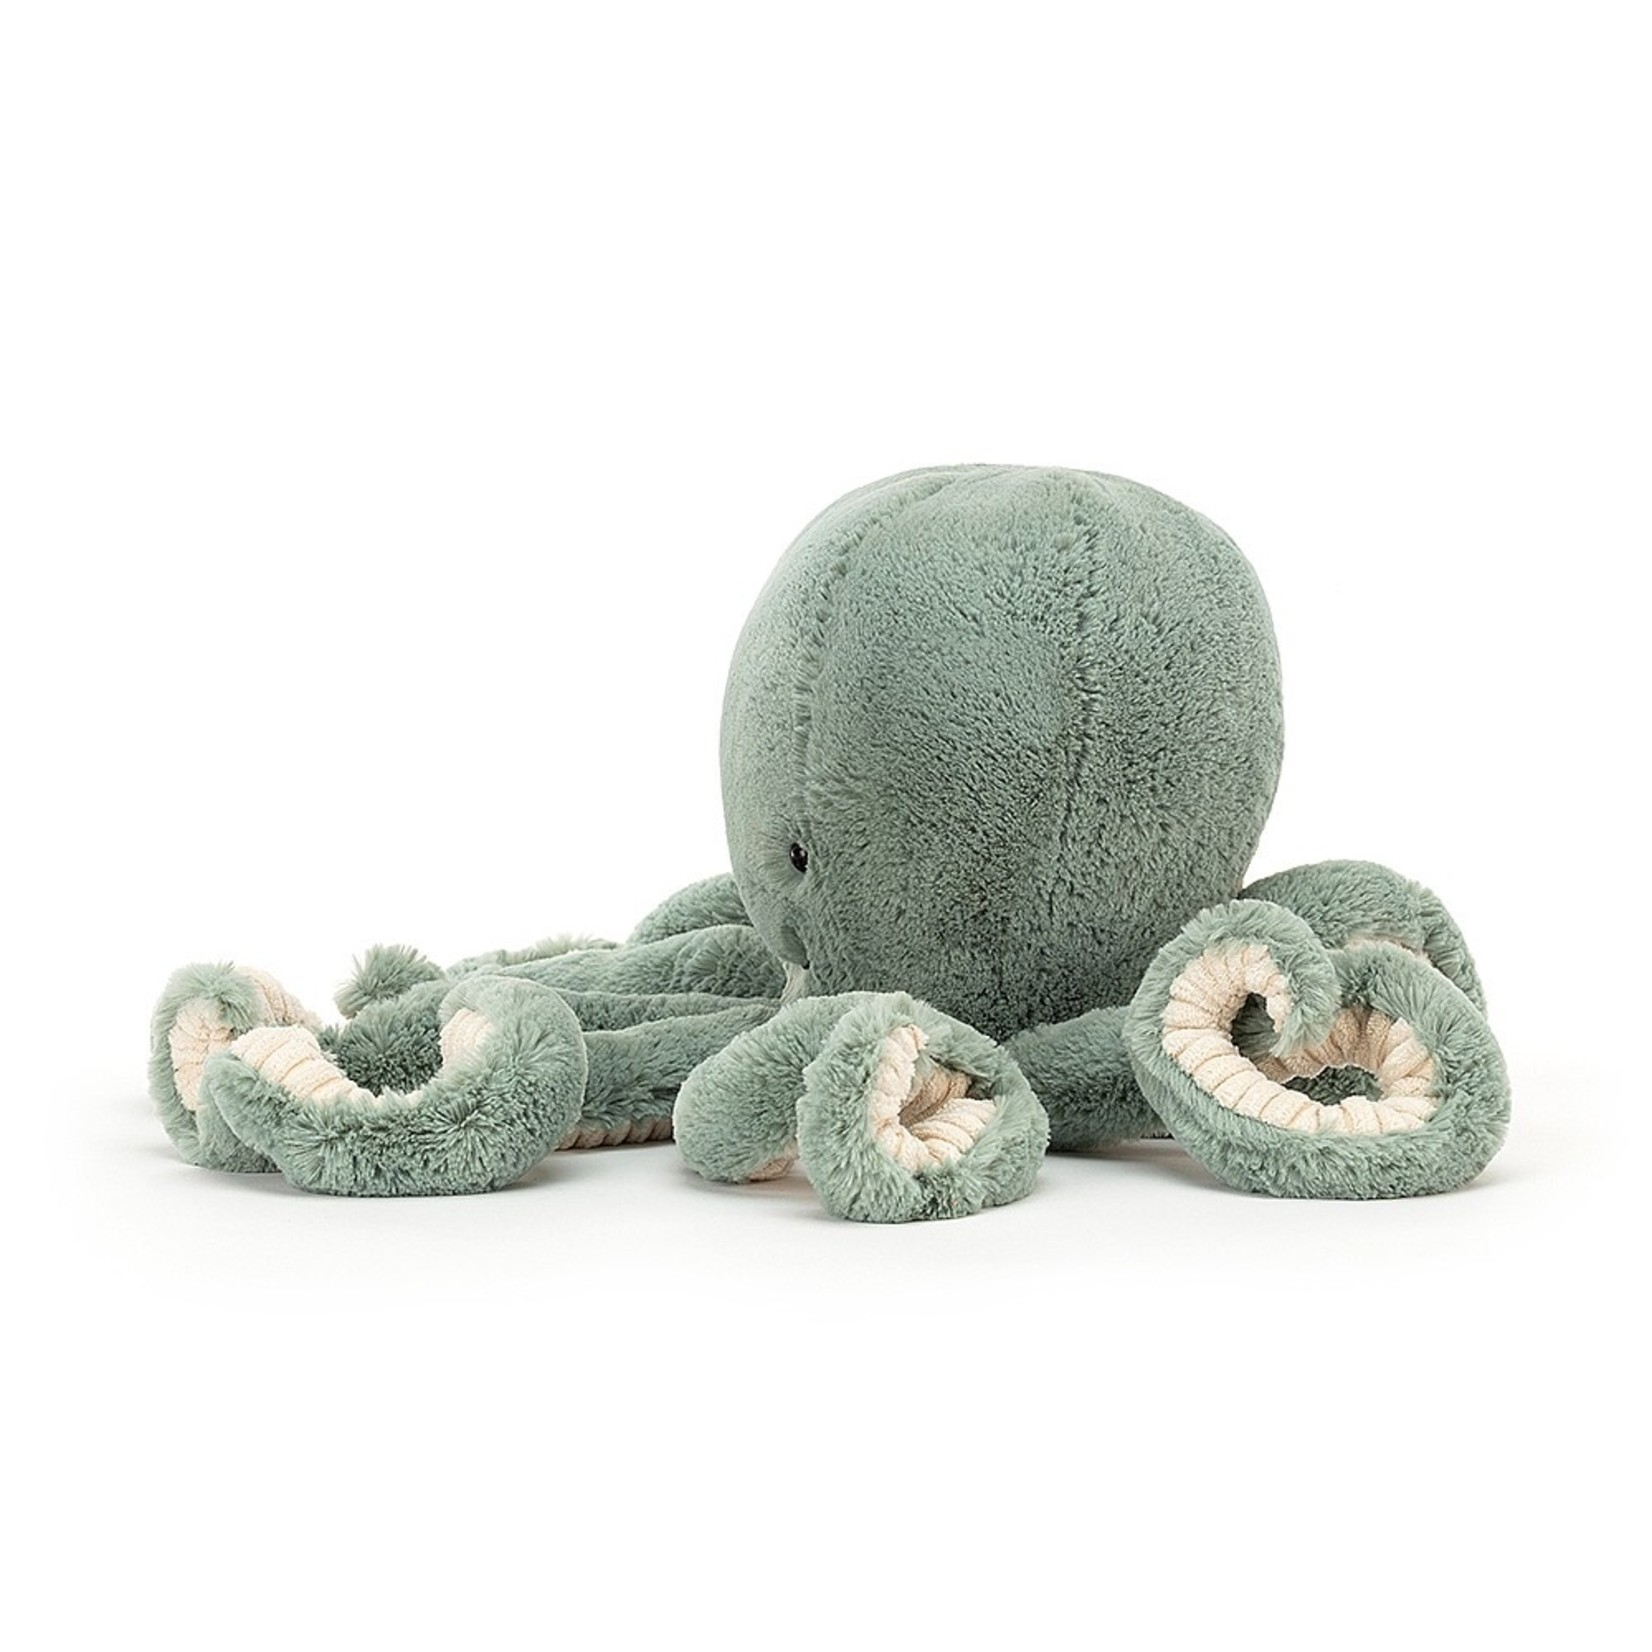 Jellycat Jellycat Octopus Odyssey Medium